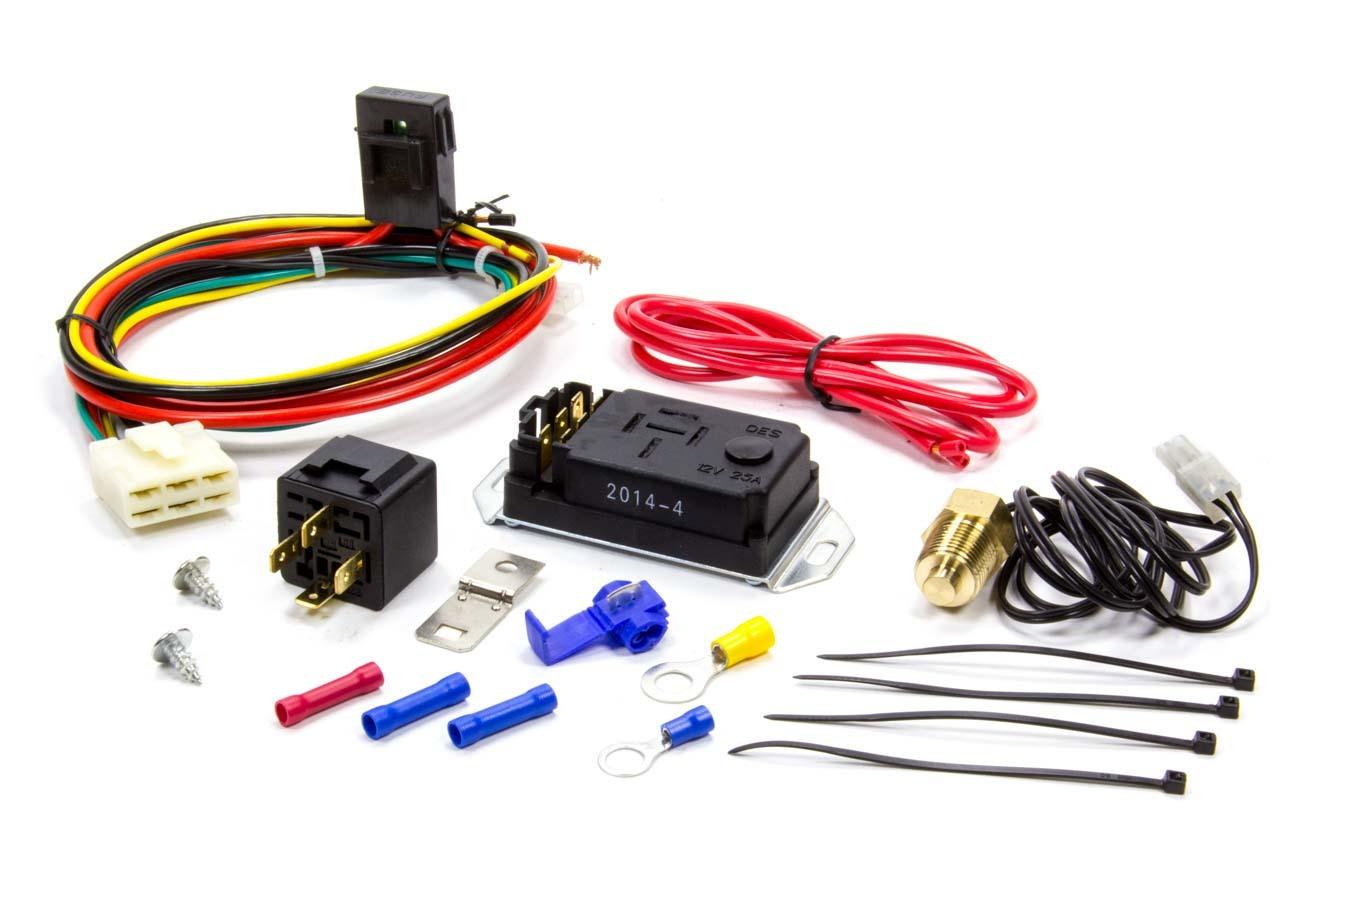 Proform 69598 Fan Controller, Adjustable, 150-240 Degree F Activation Range, 3/8 in NPT Temperature Sensor, 30 amp Relay, Each